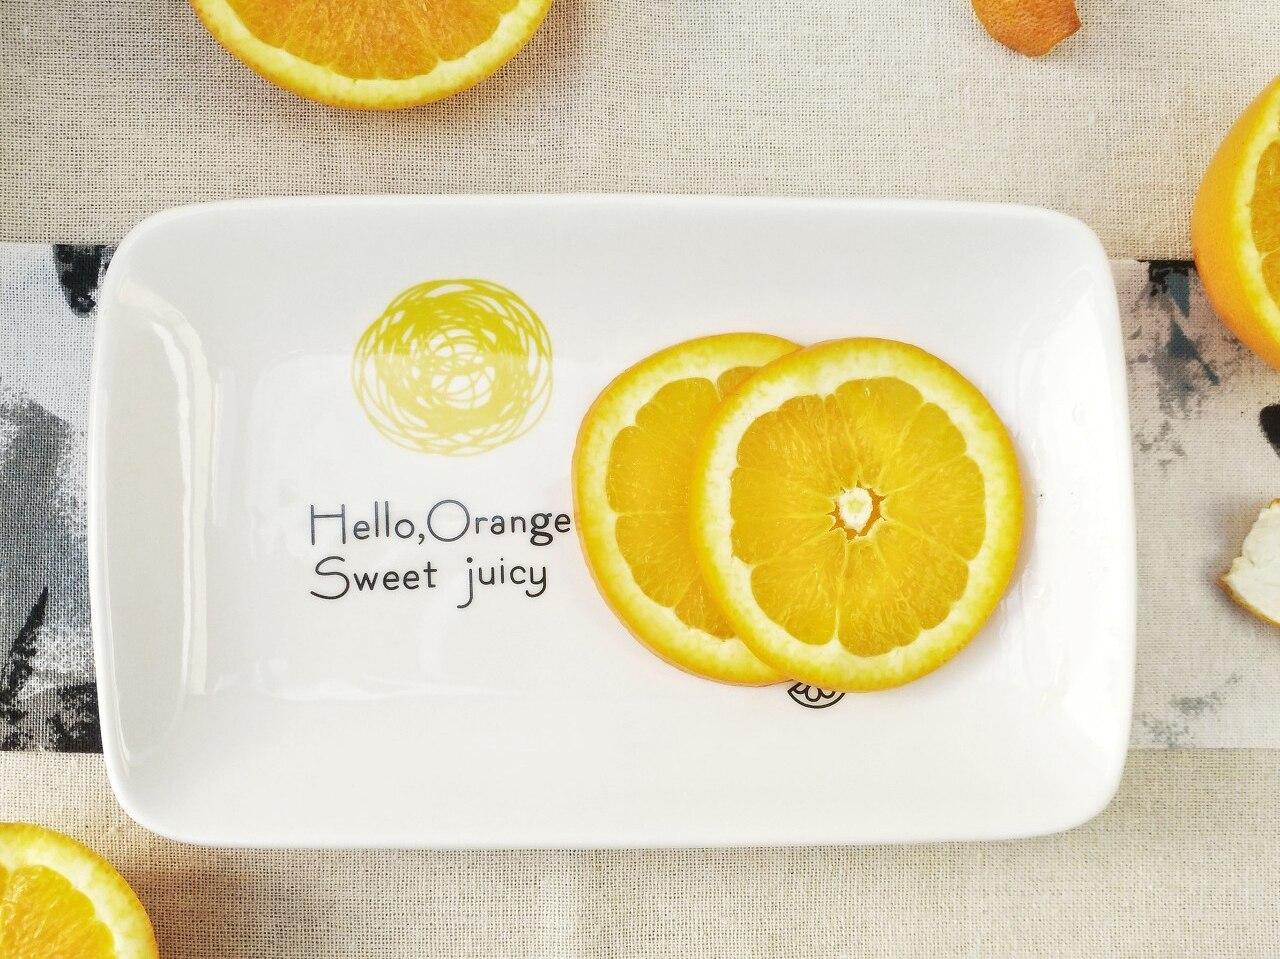 H1ff2a725a0e647478aa194928bae7e4dI 300W Lemon Citrus Juicer in Blender Stainless Steel Hand Pressed Household Electric Citrus Juicer Hand Orange Squeezer Sonifer